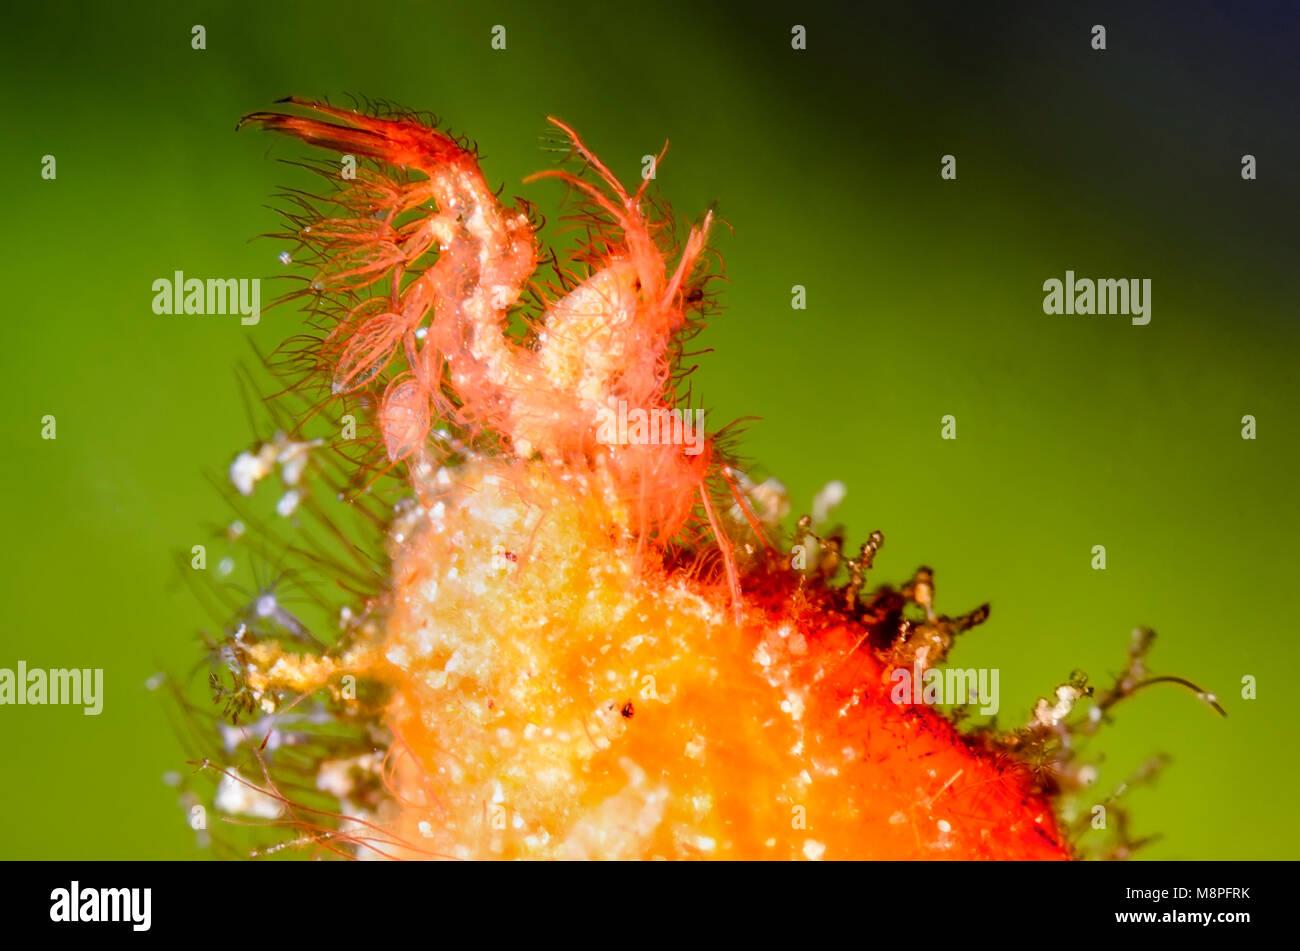 Hairy or algae shrimp, Phycocaris simulans, Anilao, Batangas, Philippines, Pacific - Stock Image